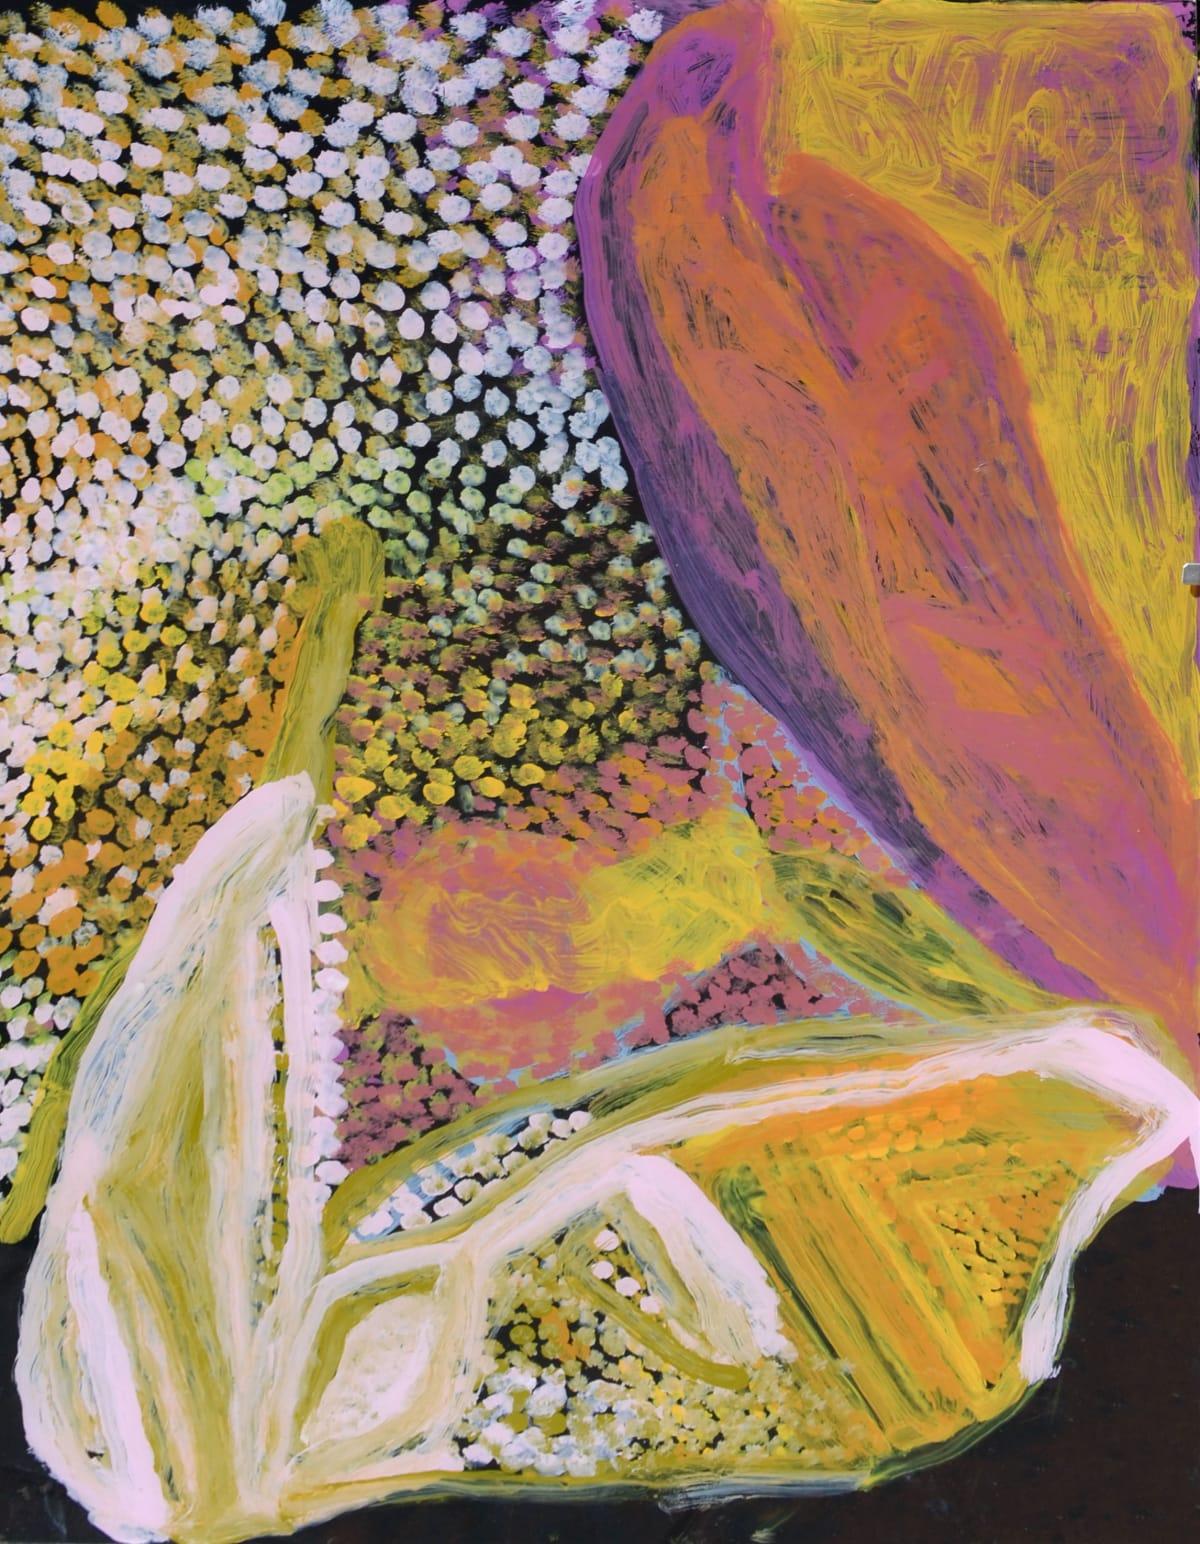 Nada ( Tjigilia) Rawlins Linjalangu acrylic on polycarbonate 90 x 60 cm